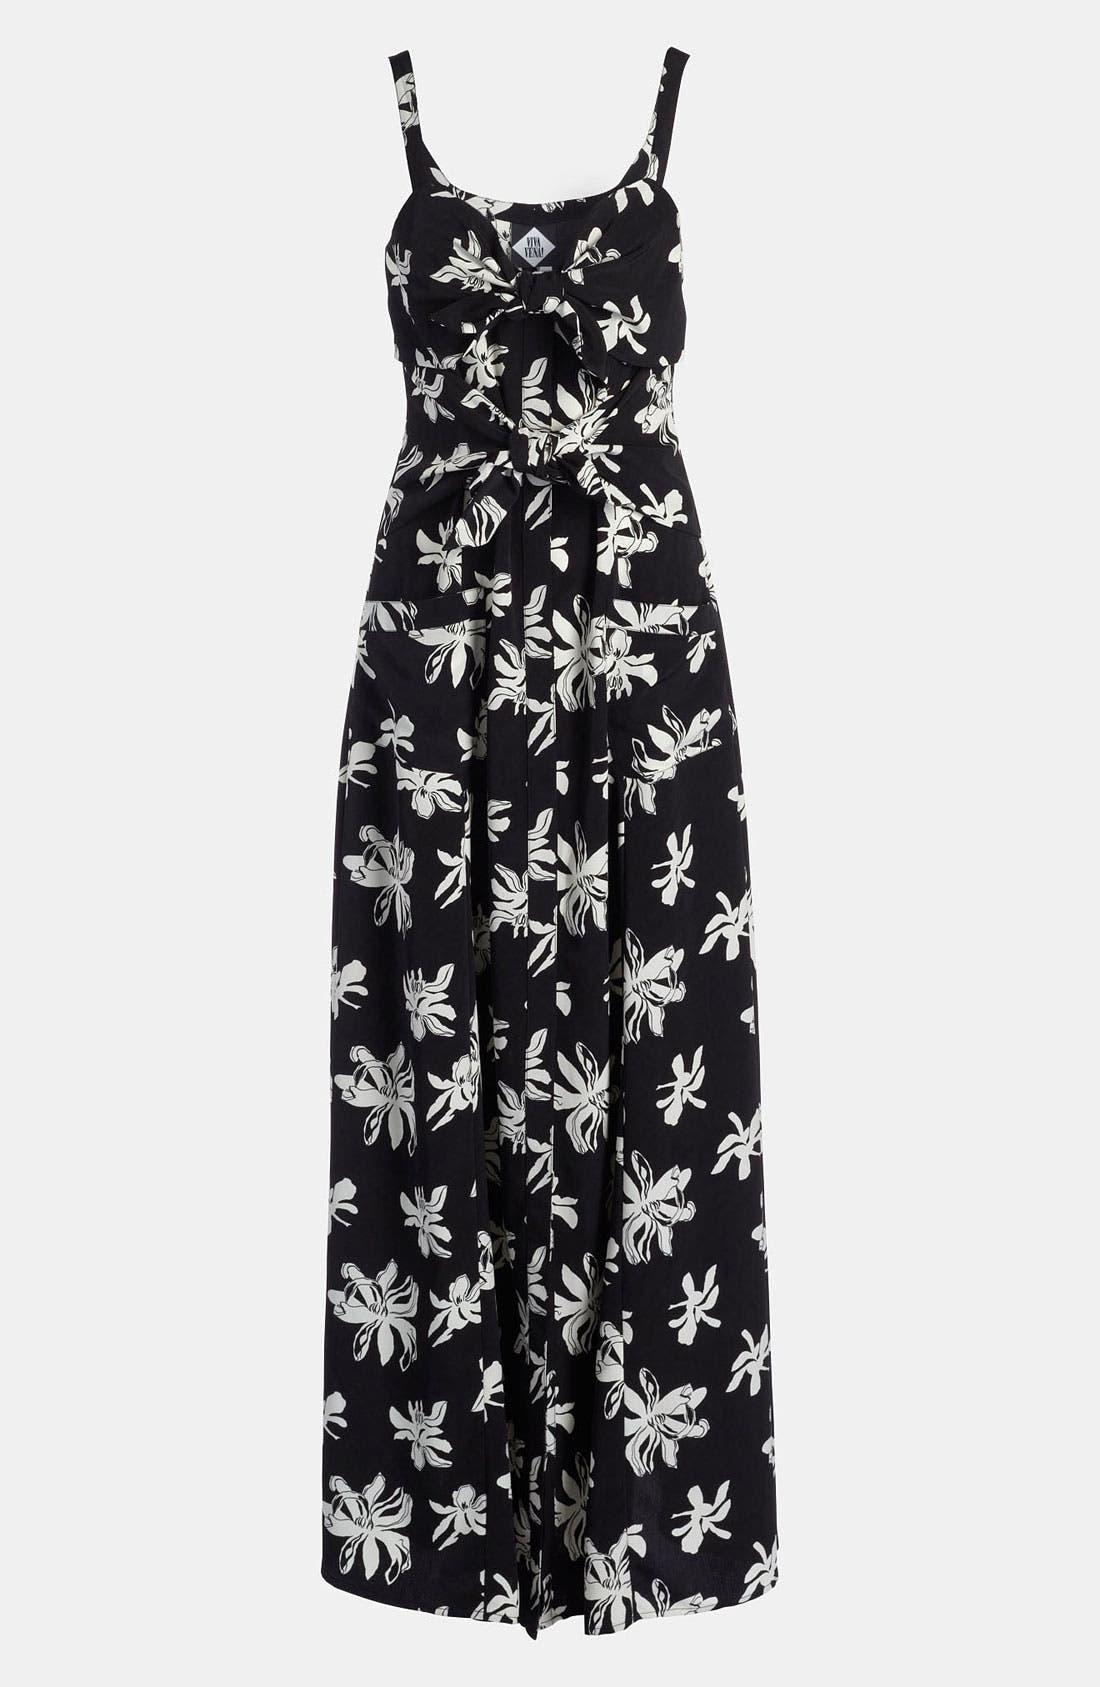 Alternate Image 1 Selected - Viva Vena! 'Art Collector' Dress